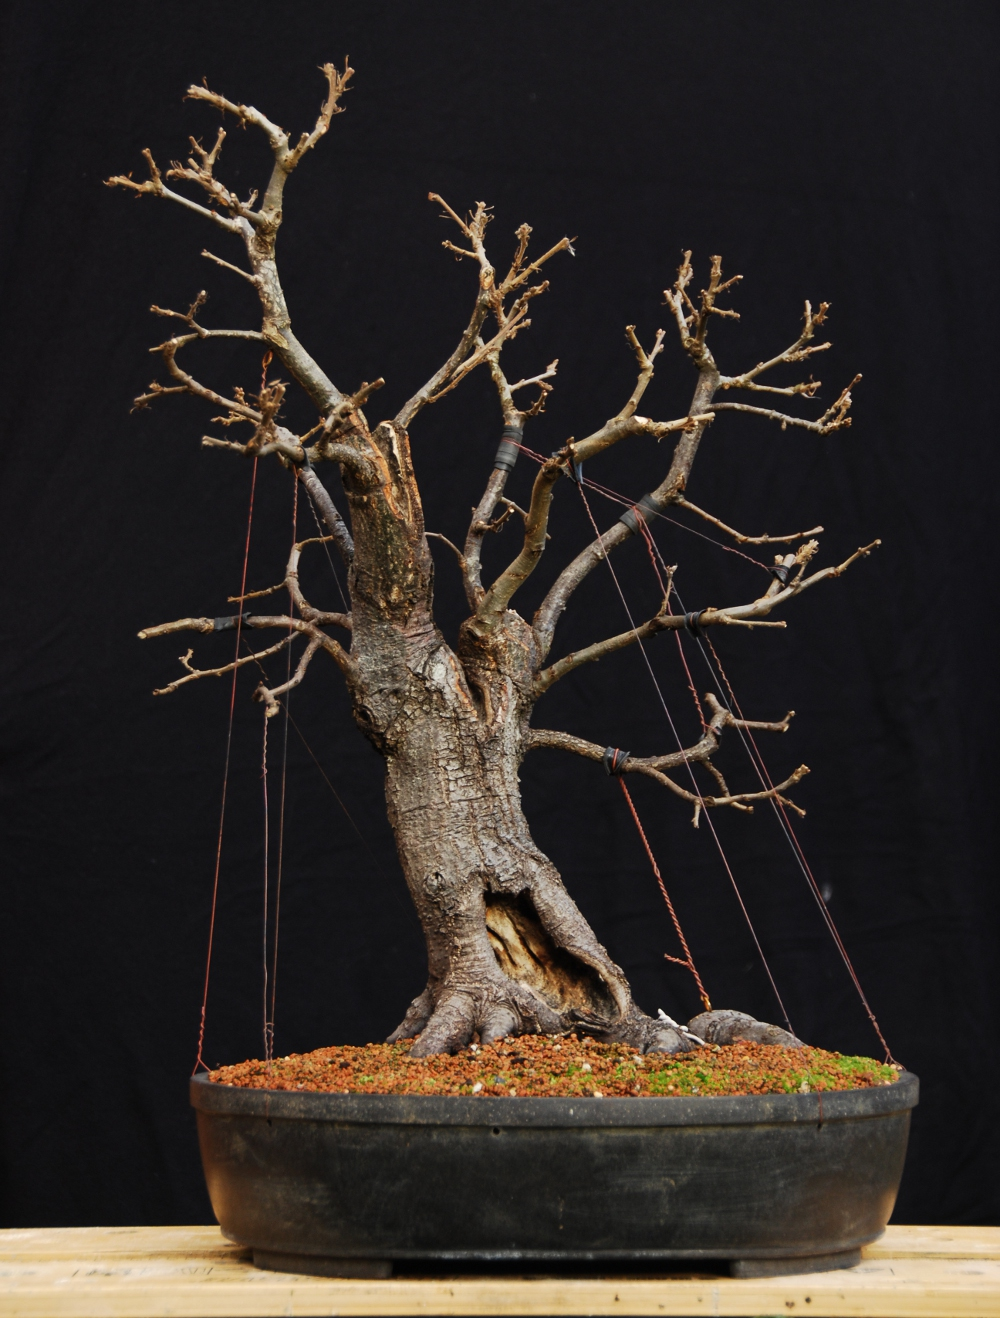 silva naturalis naturalistic oak bonsai with guy wires rh silvanaturalis blogspot com Bonsai Copper Wire Bonsai Copper Wire